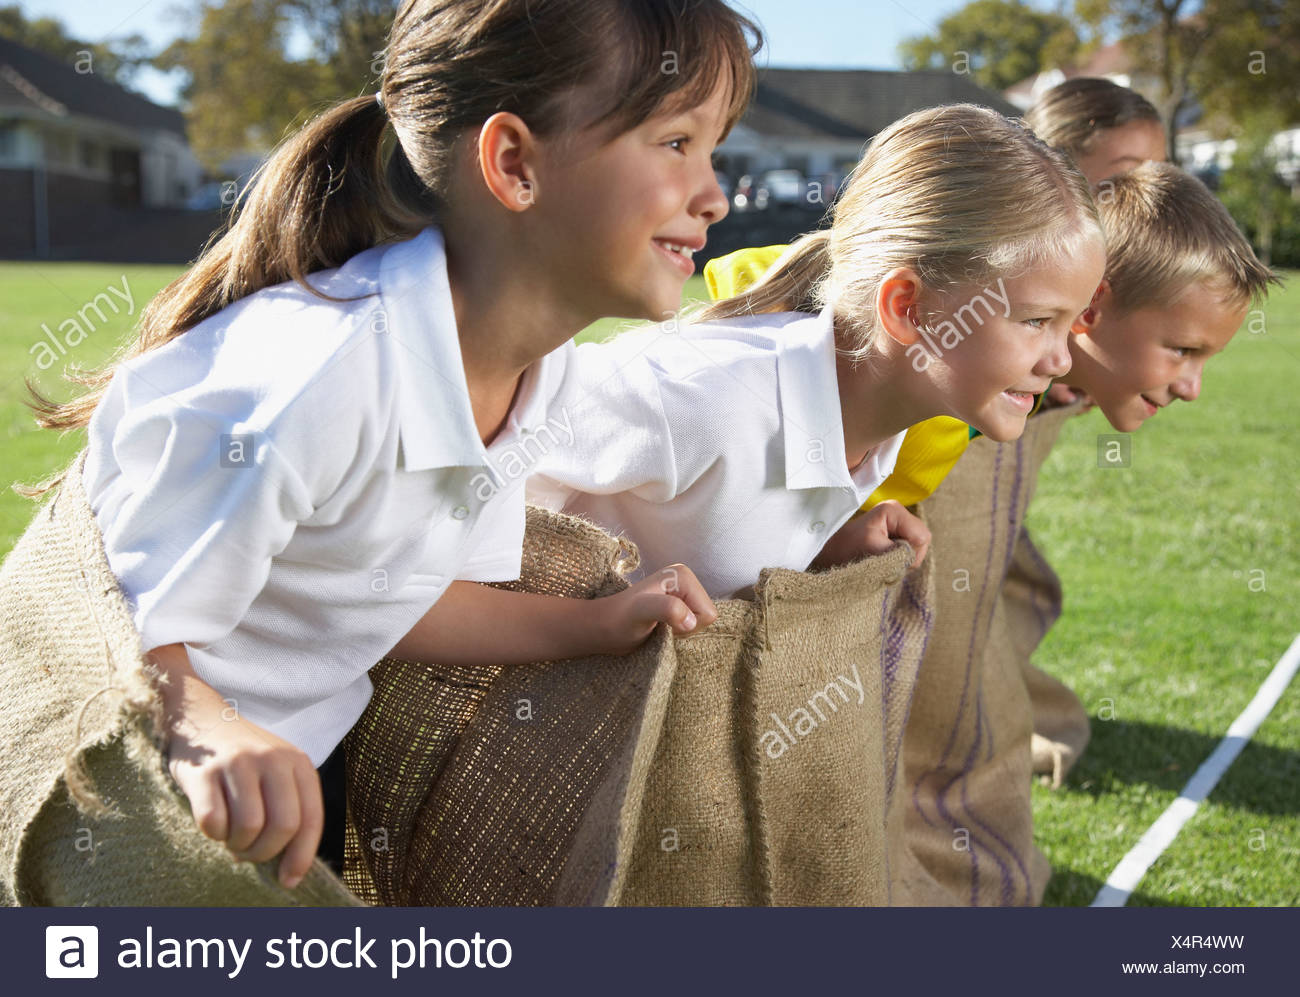 Kids potato sack racing Stock Photo